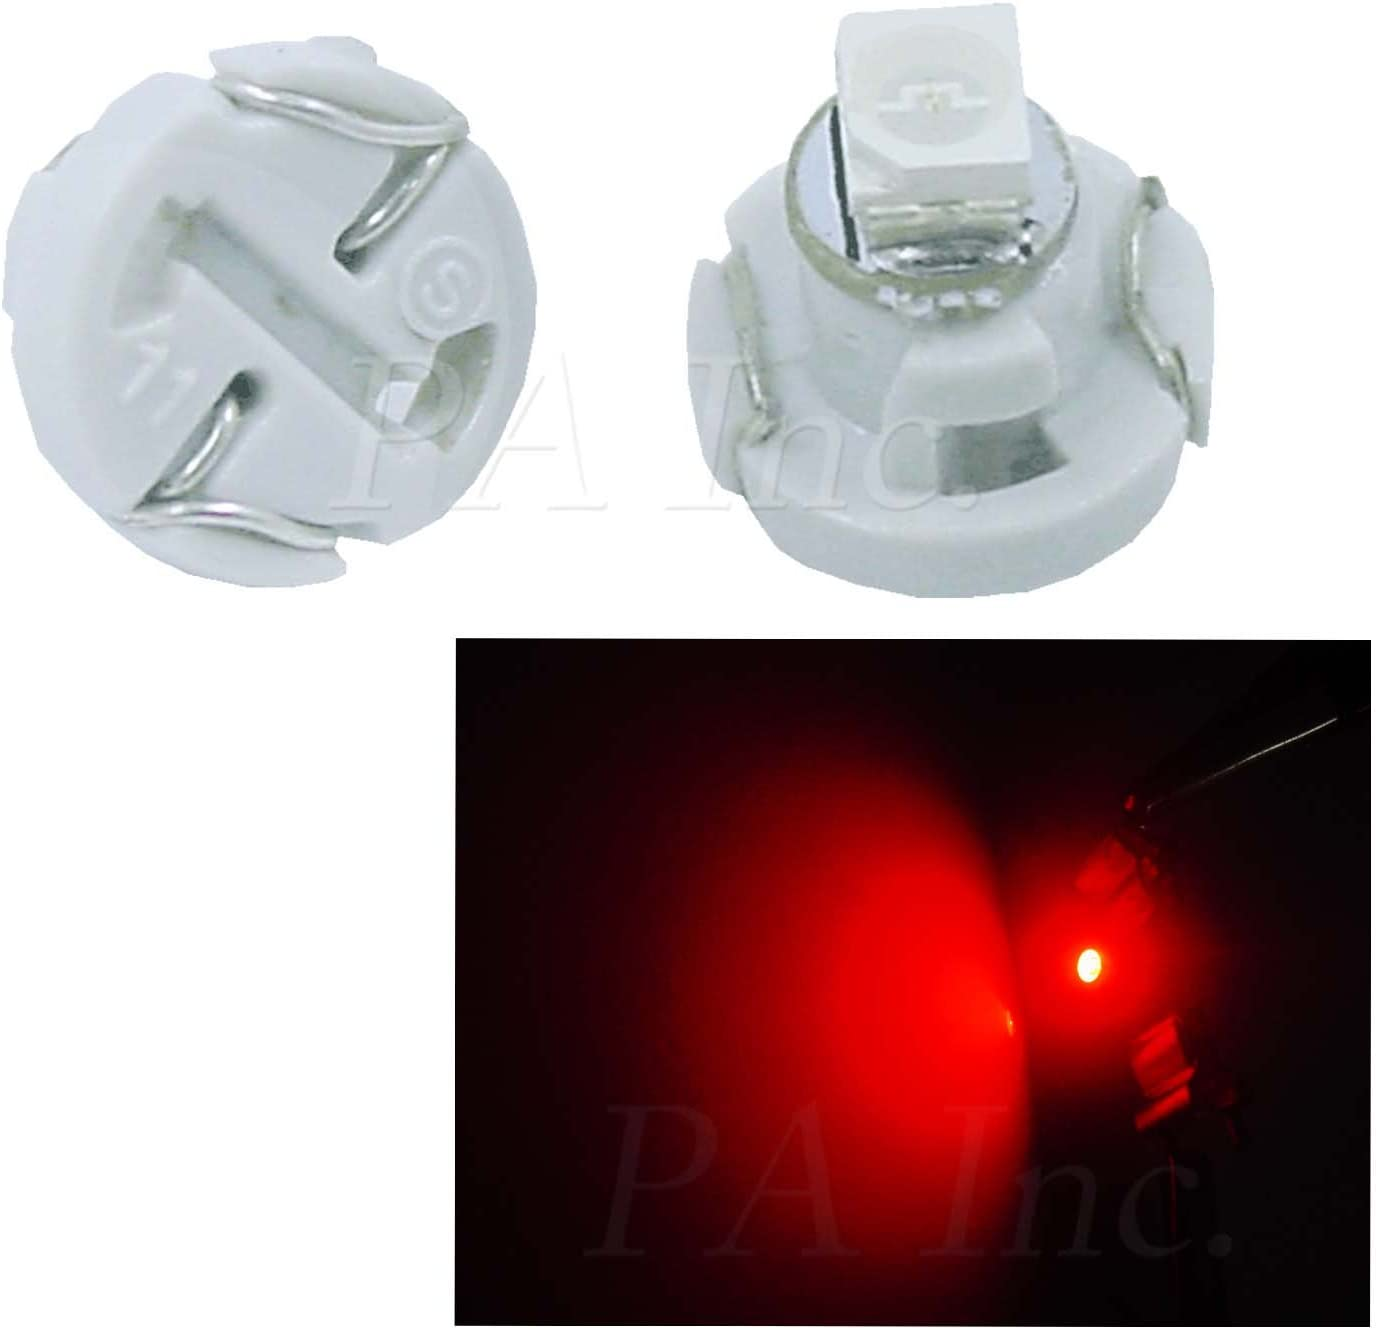 PA 20pcs T3 Car Dash Board Instrument LED Bulbs 5 color options 12v (Red)